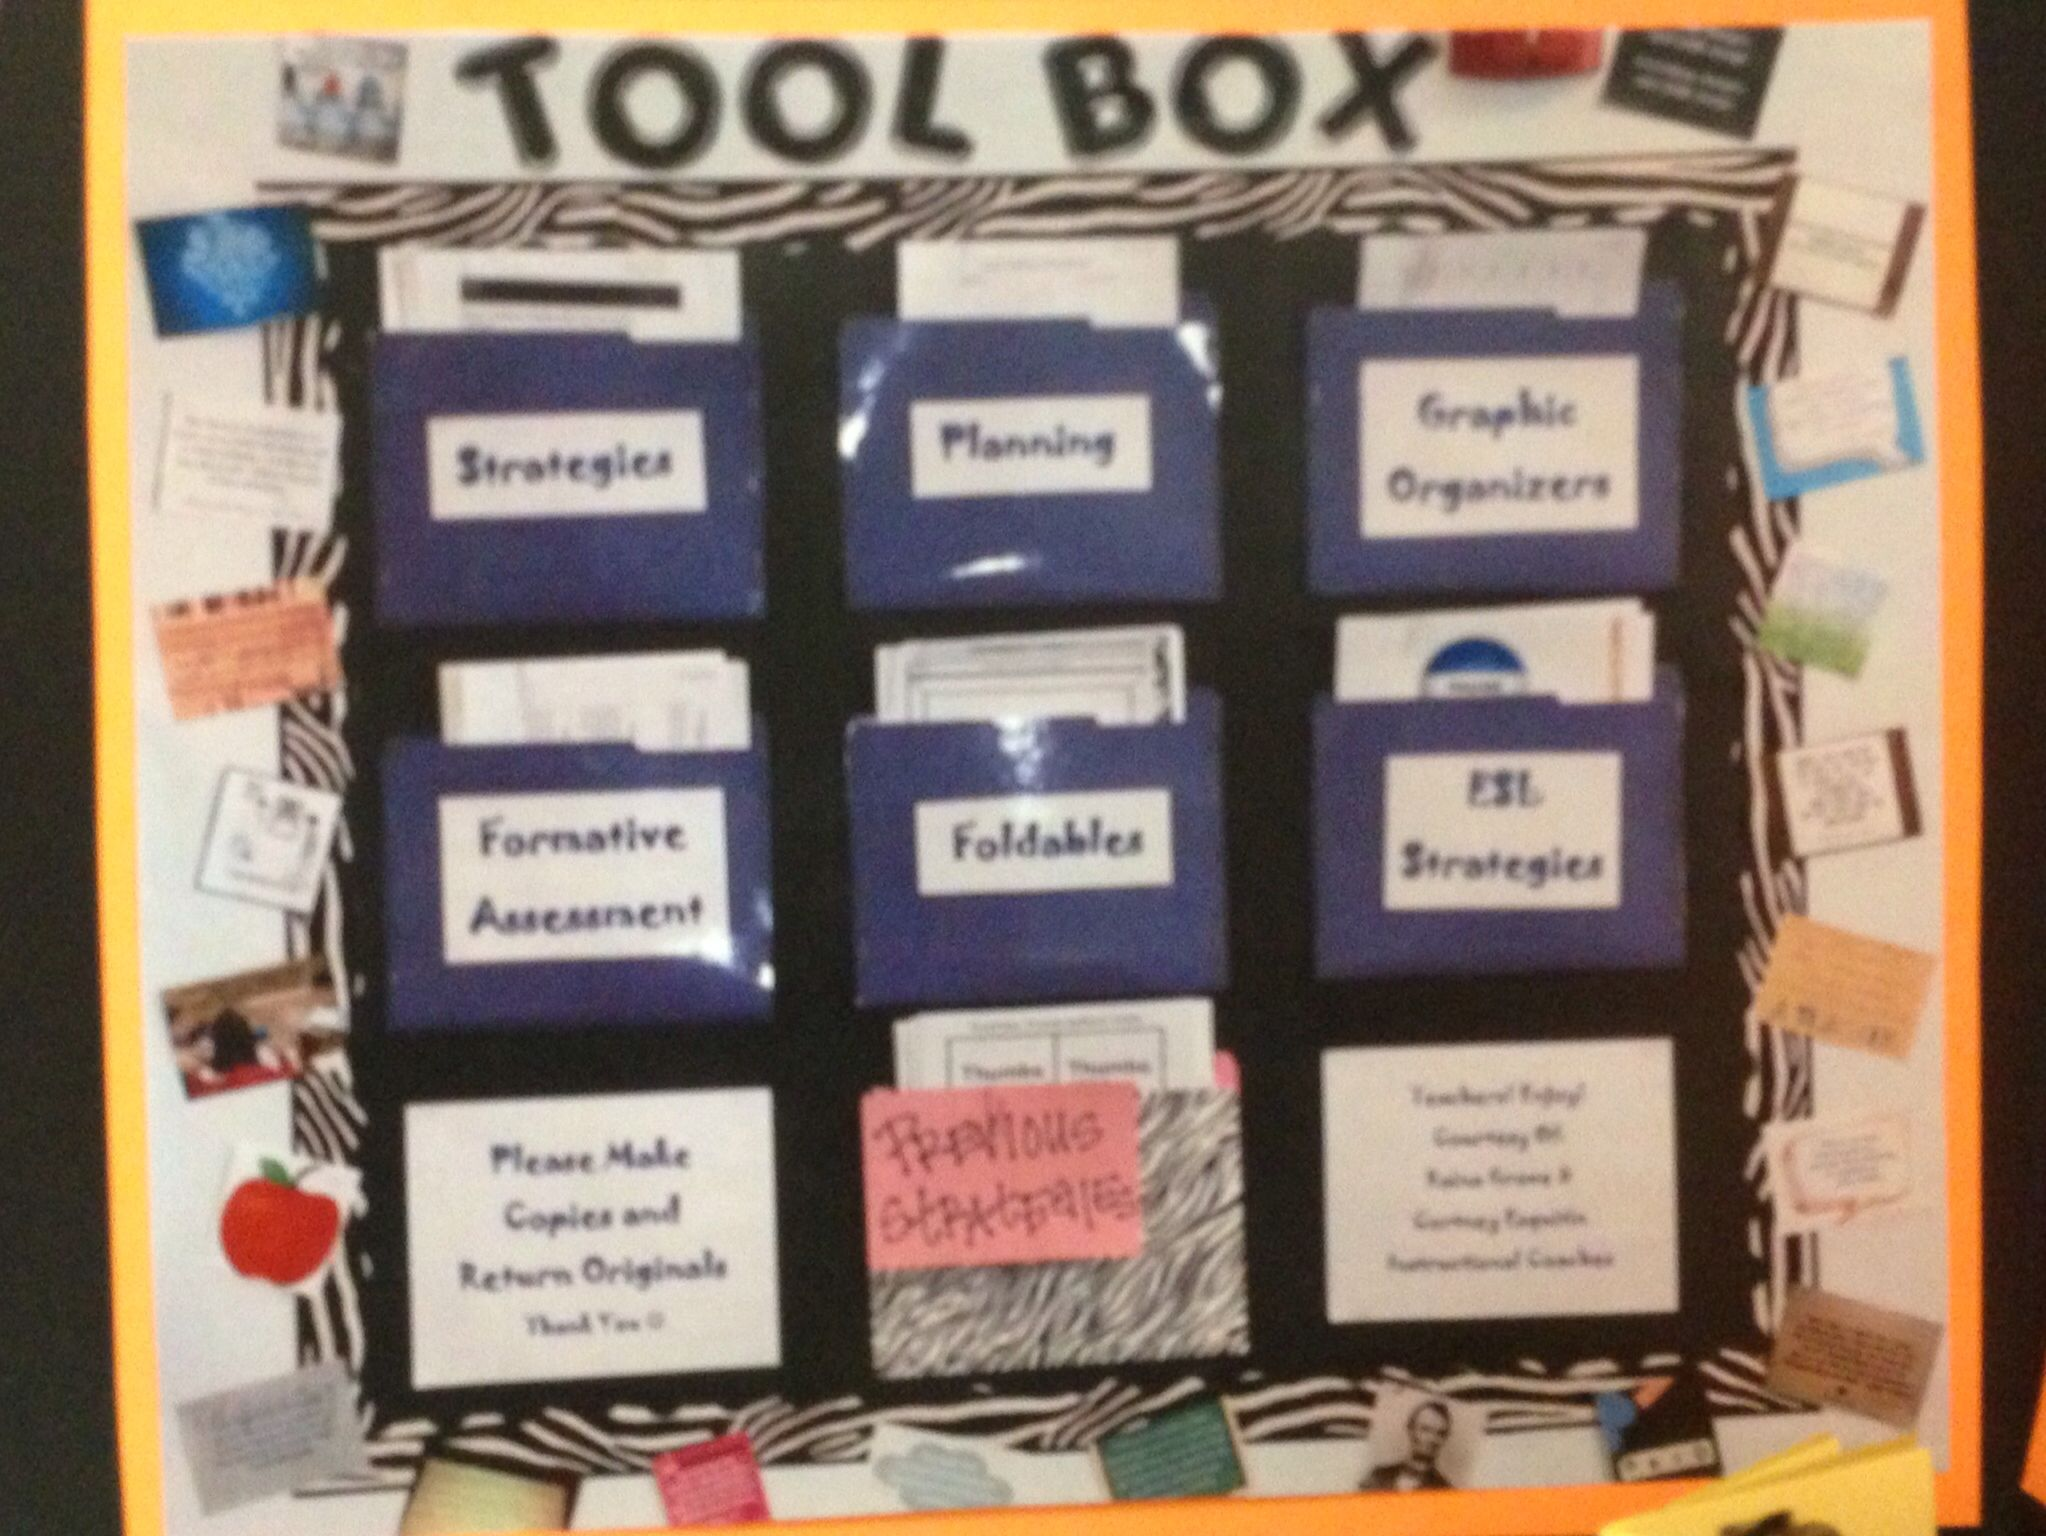 Make Bulletin Board In Teacher' Lounge Above